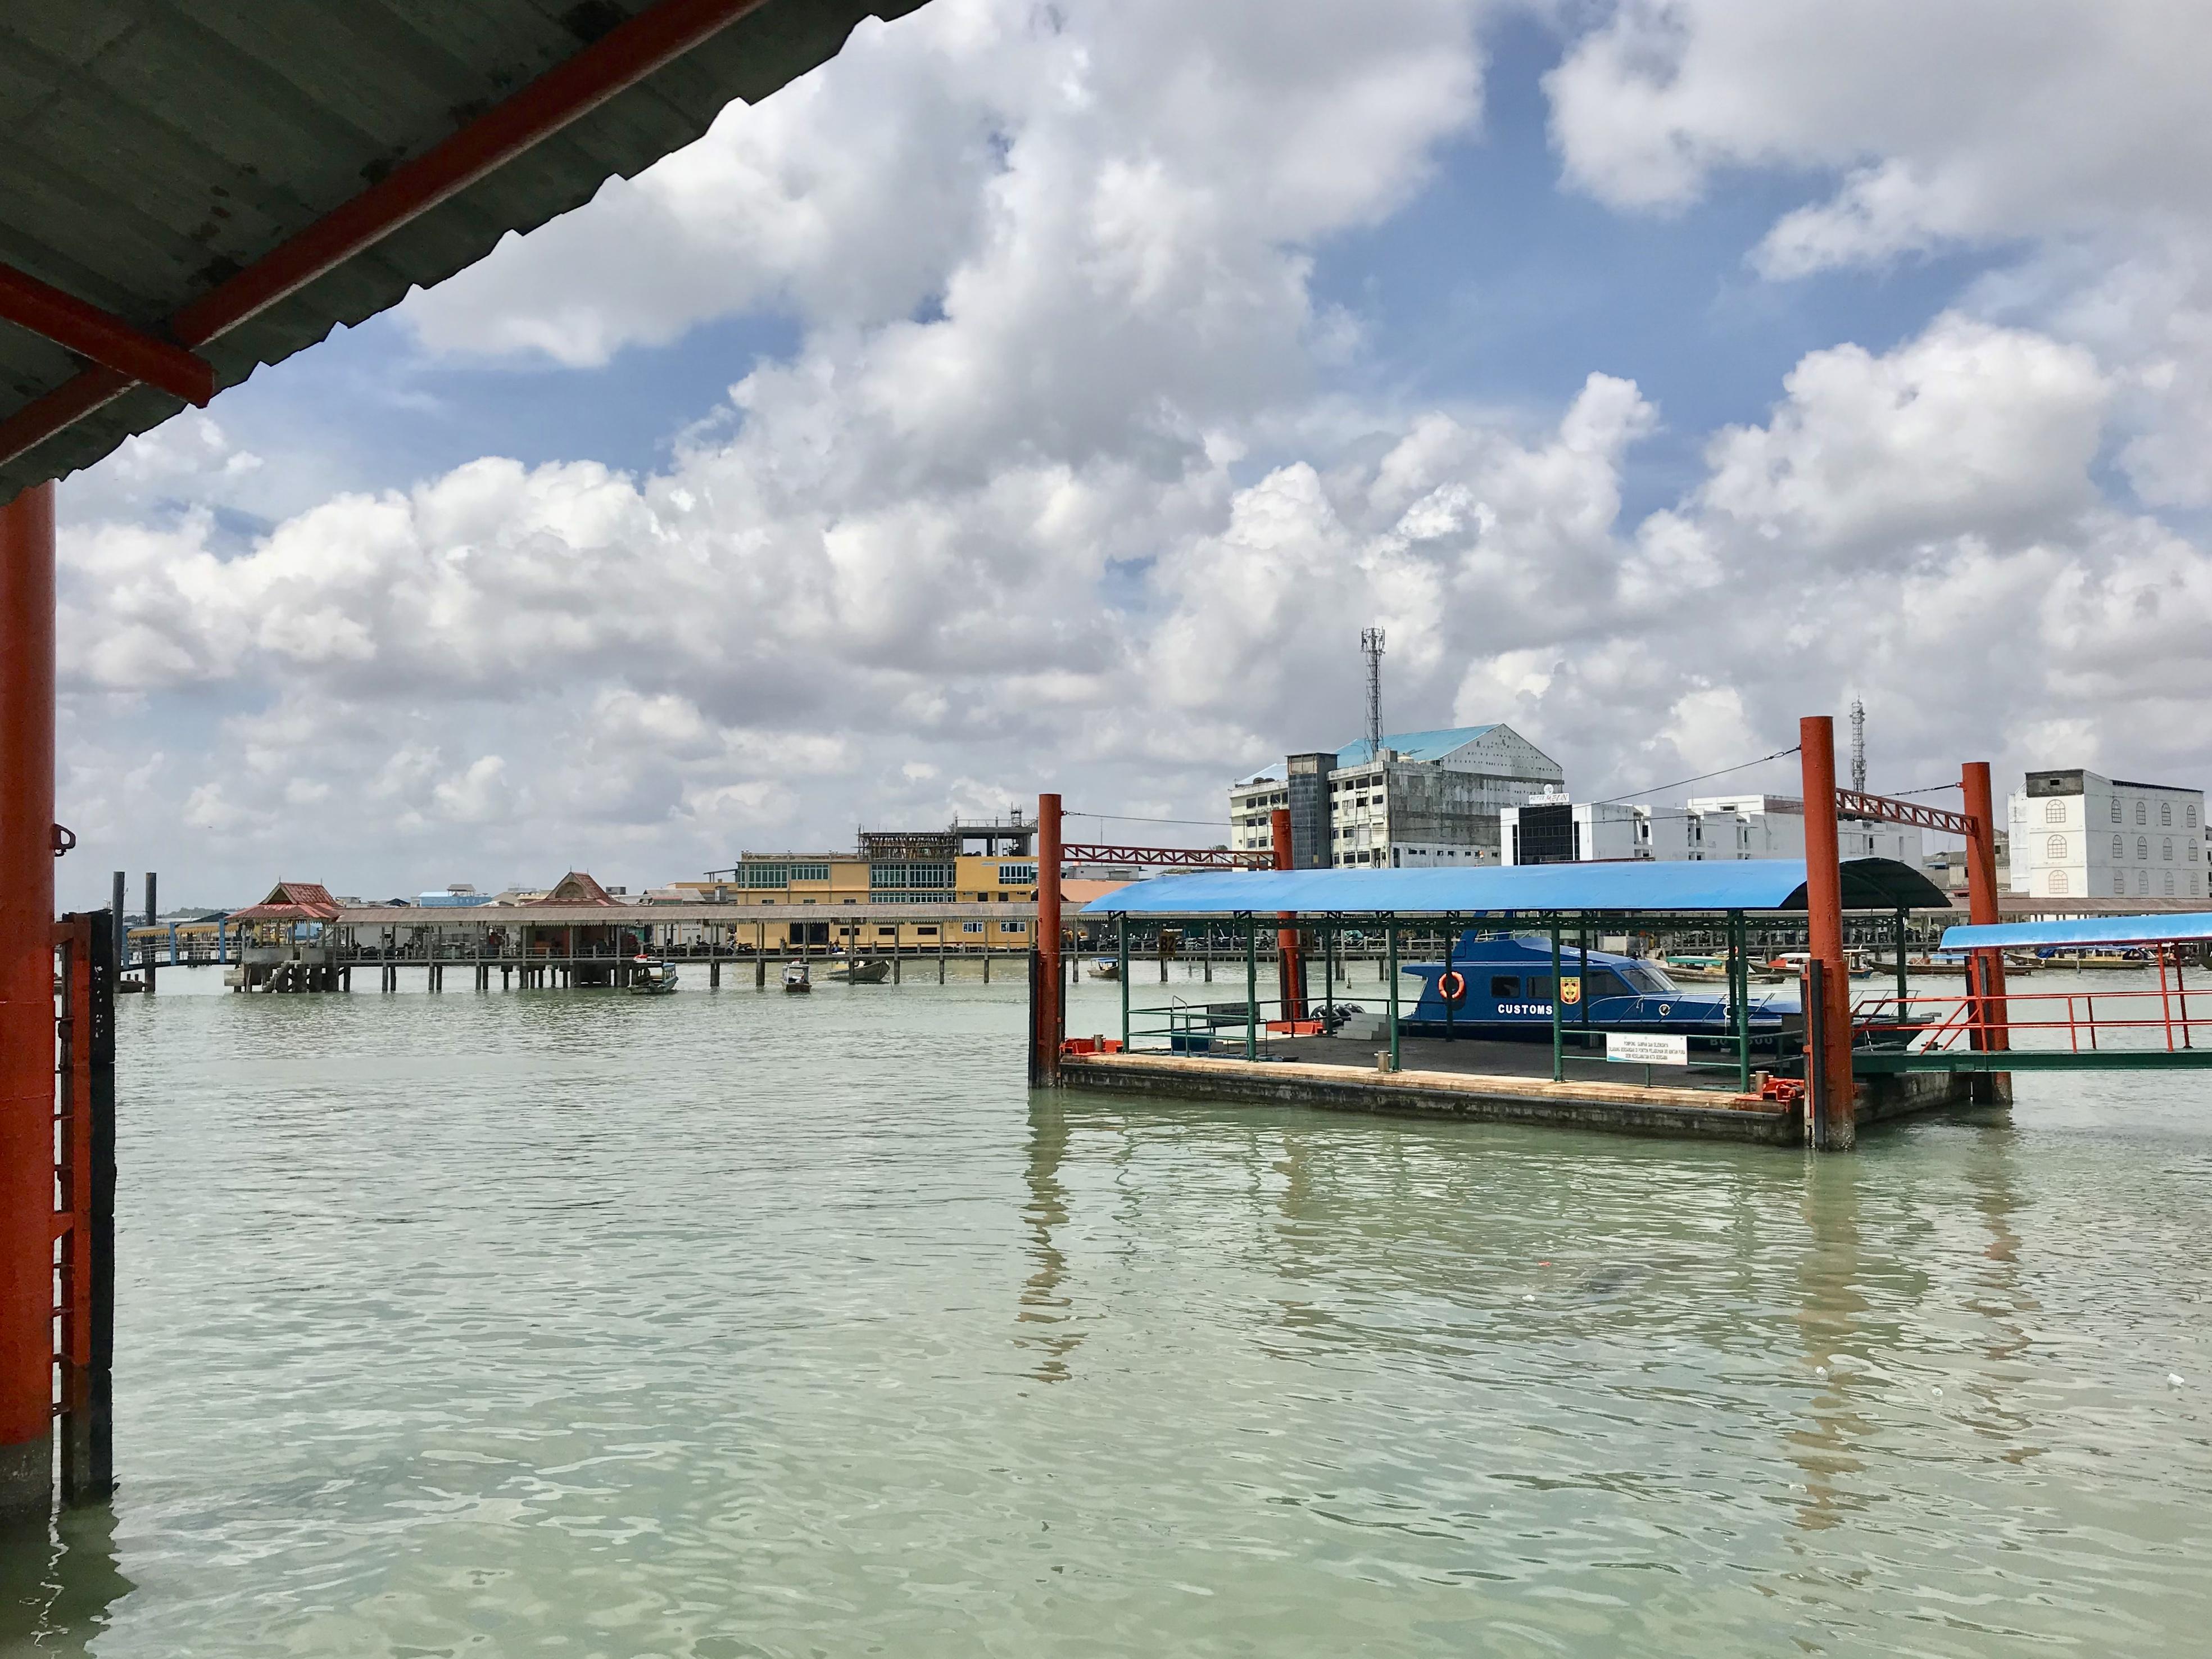 Tanjung Pinang Port View